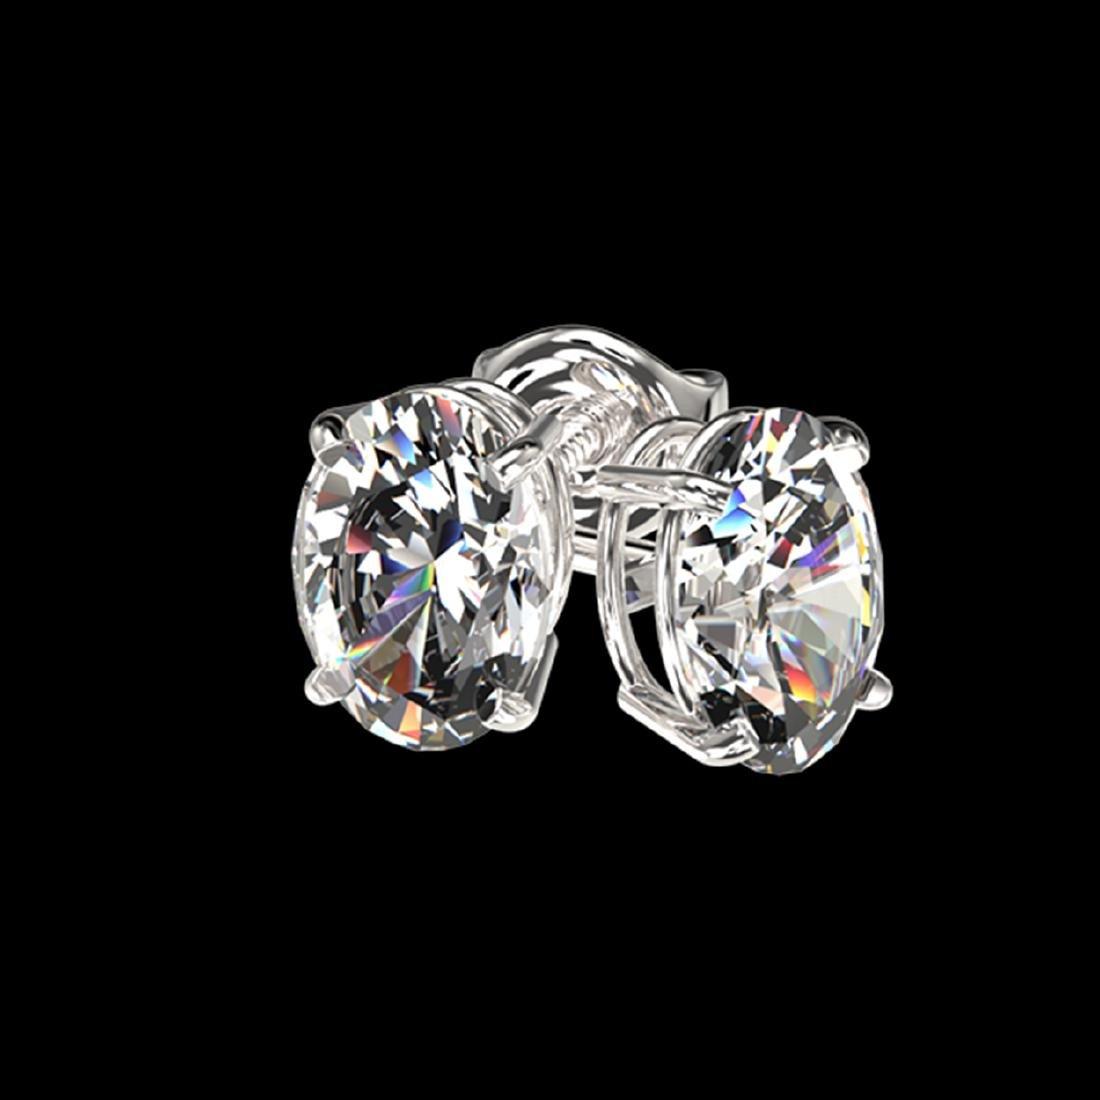 1 CTW VS/SI Quality Oval Diamond Stud Earrings Gold - - 3